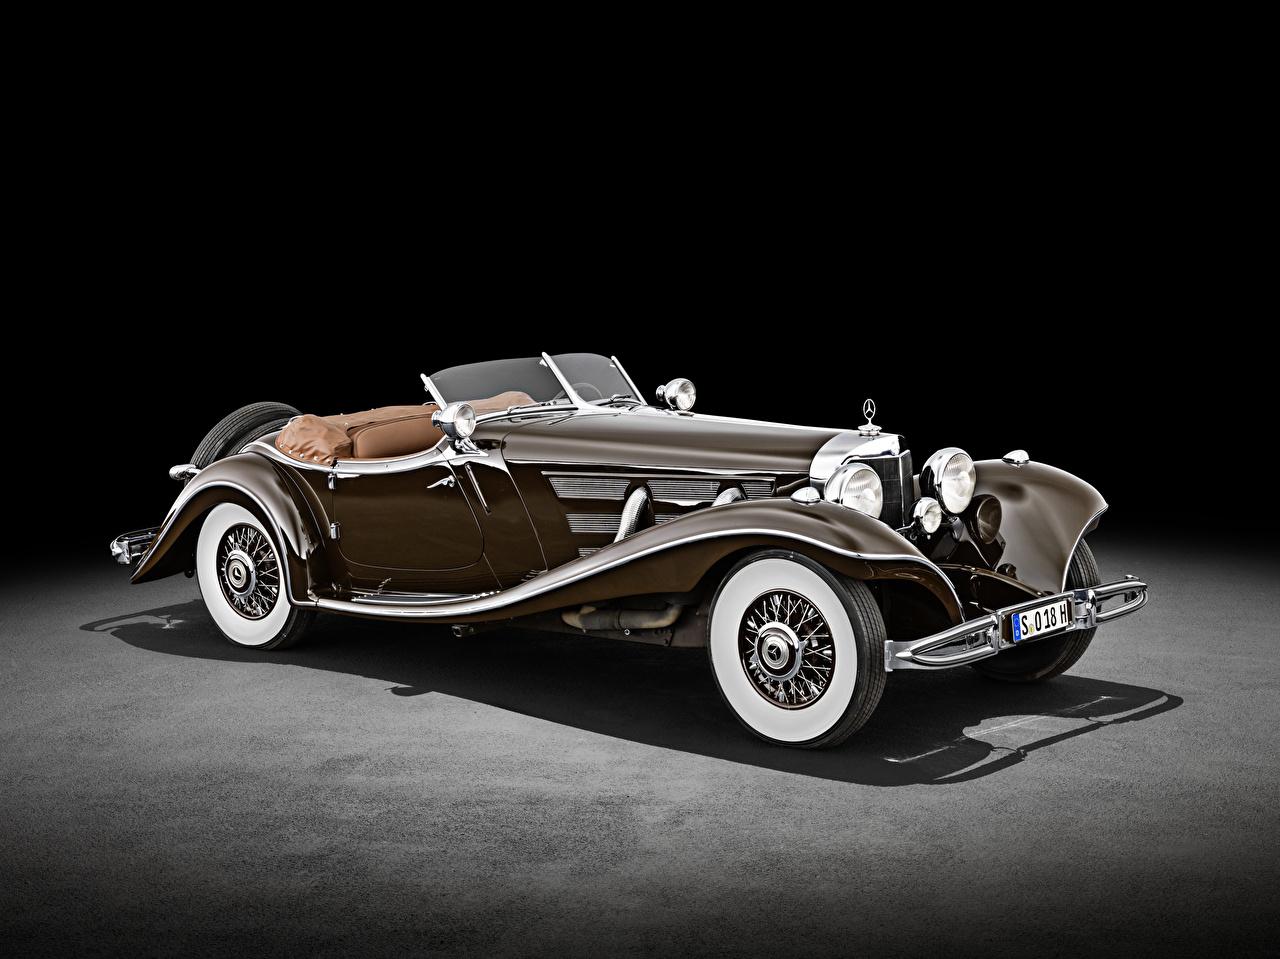 Pictures Mercedes-Benz 500 K Special Roadster (W 29), 1934 Retro Brown Cars vintage antique auto automobile